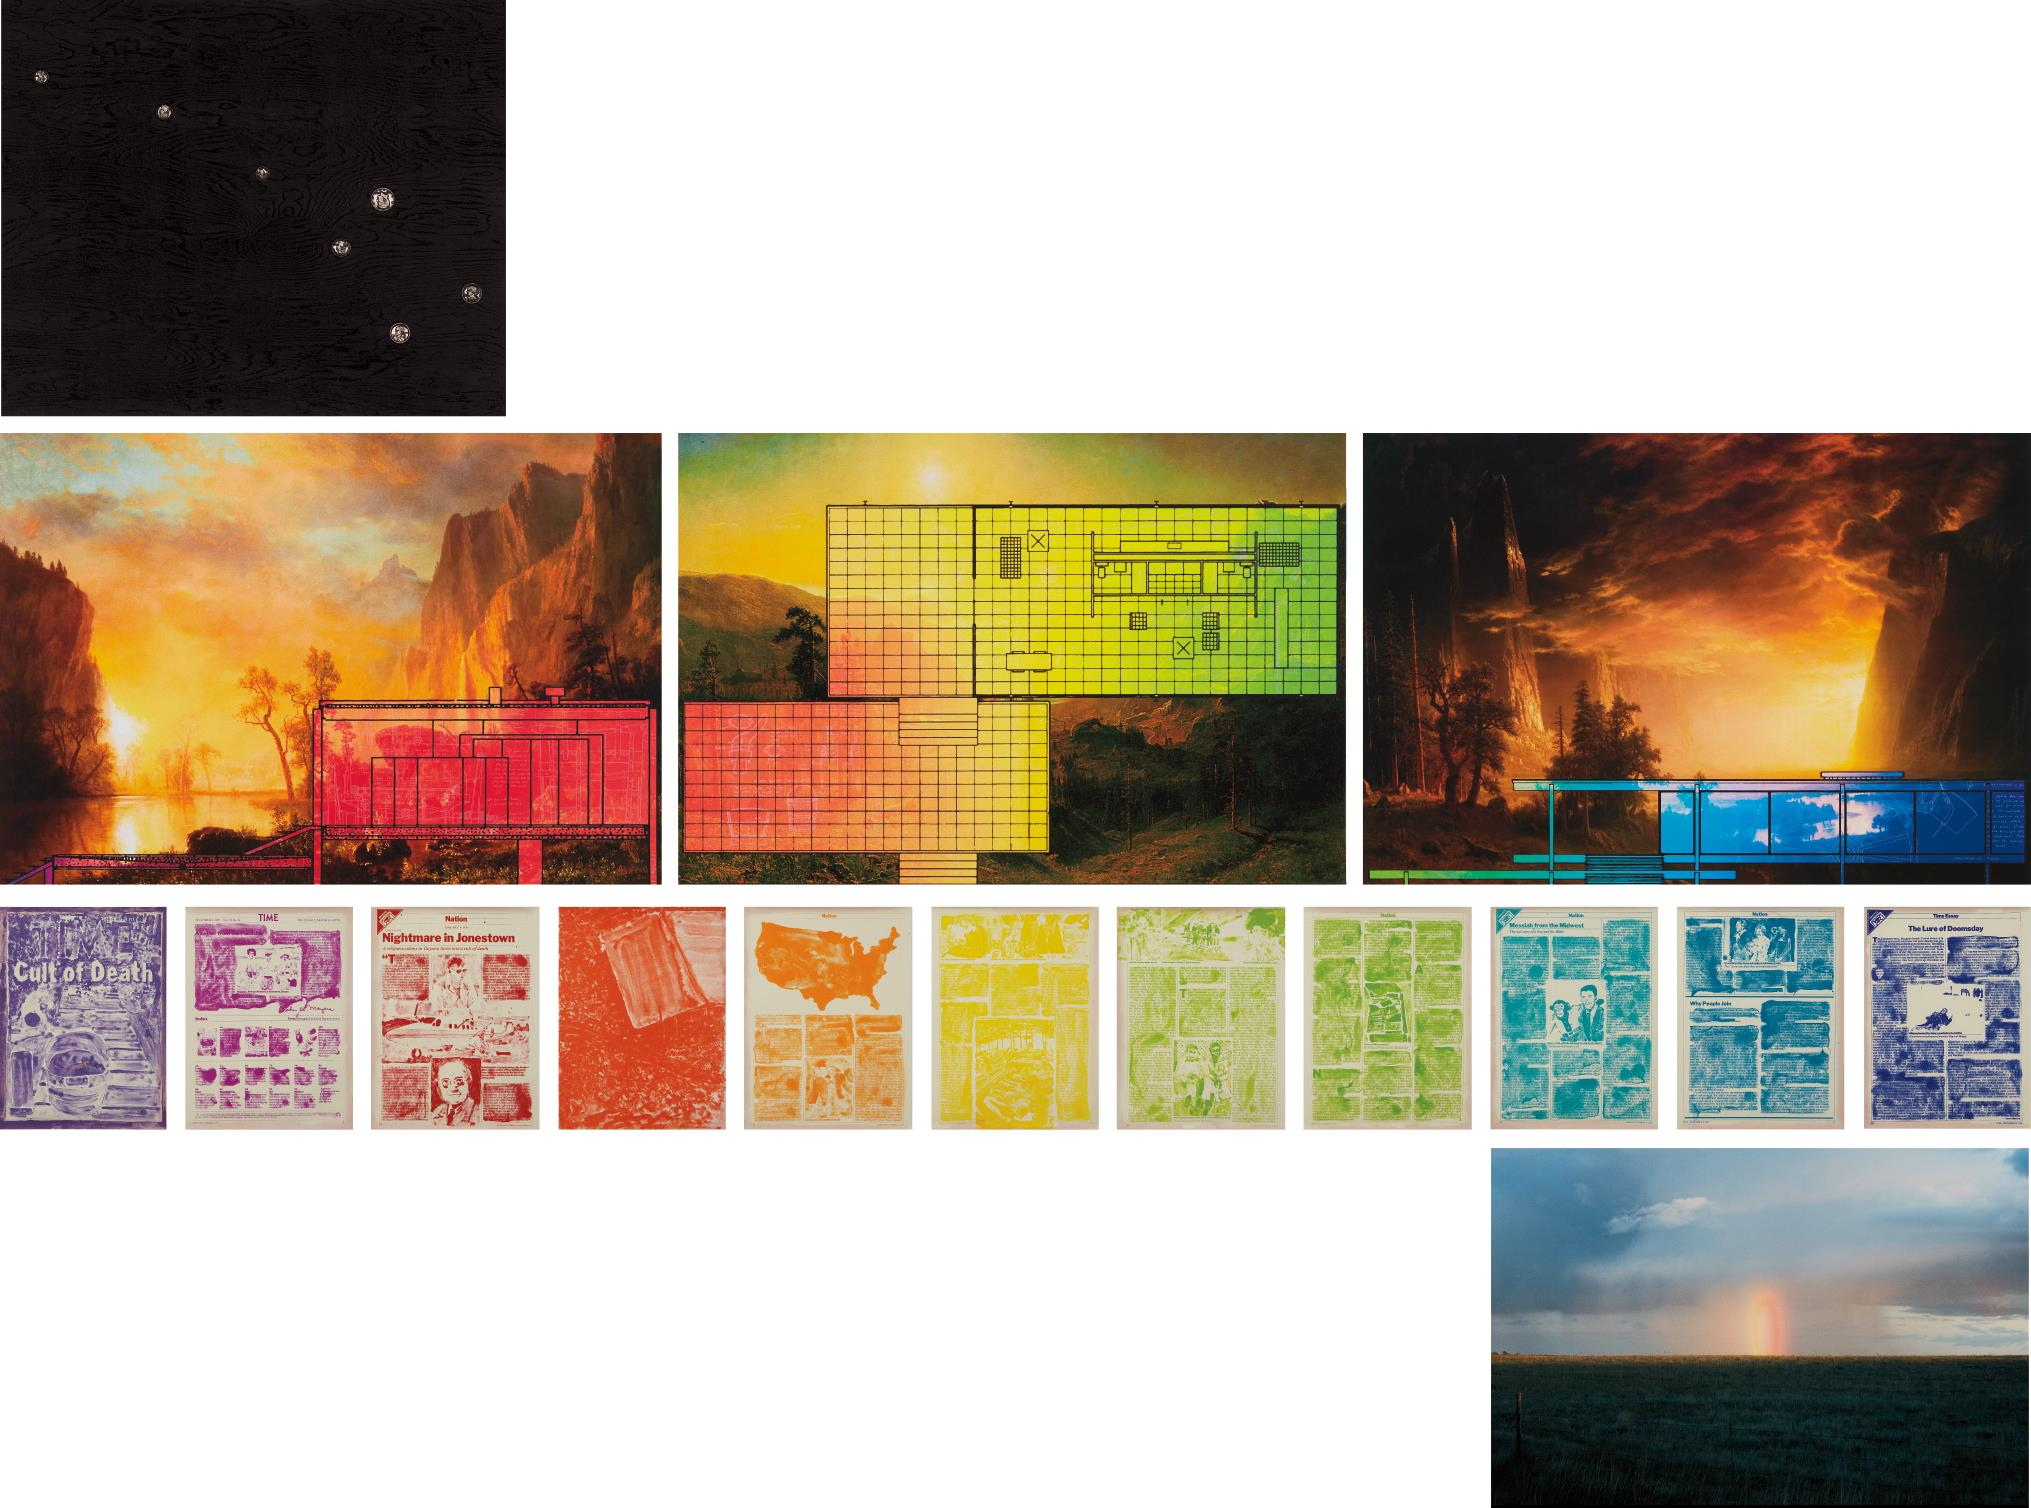 Matthew Day Jackson-Das Wochenendhaus from The Dymaxion Series-2007